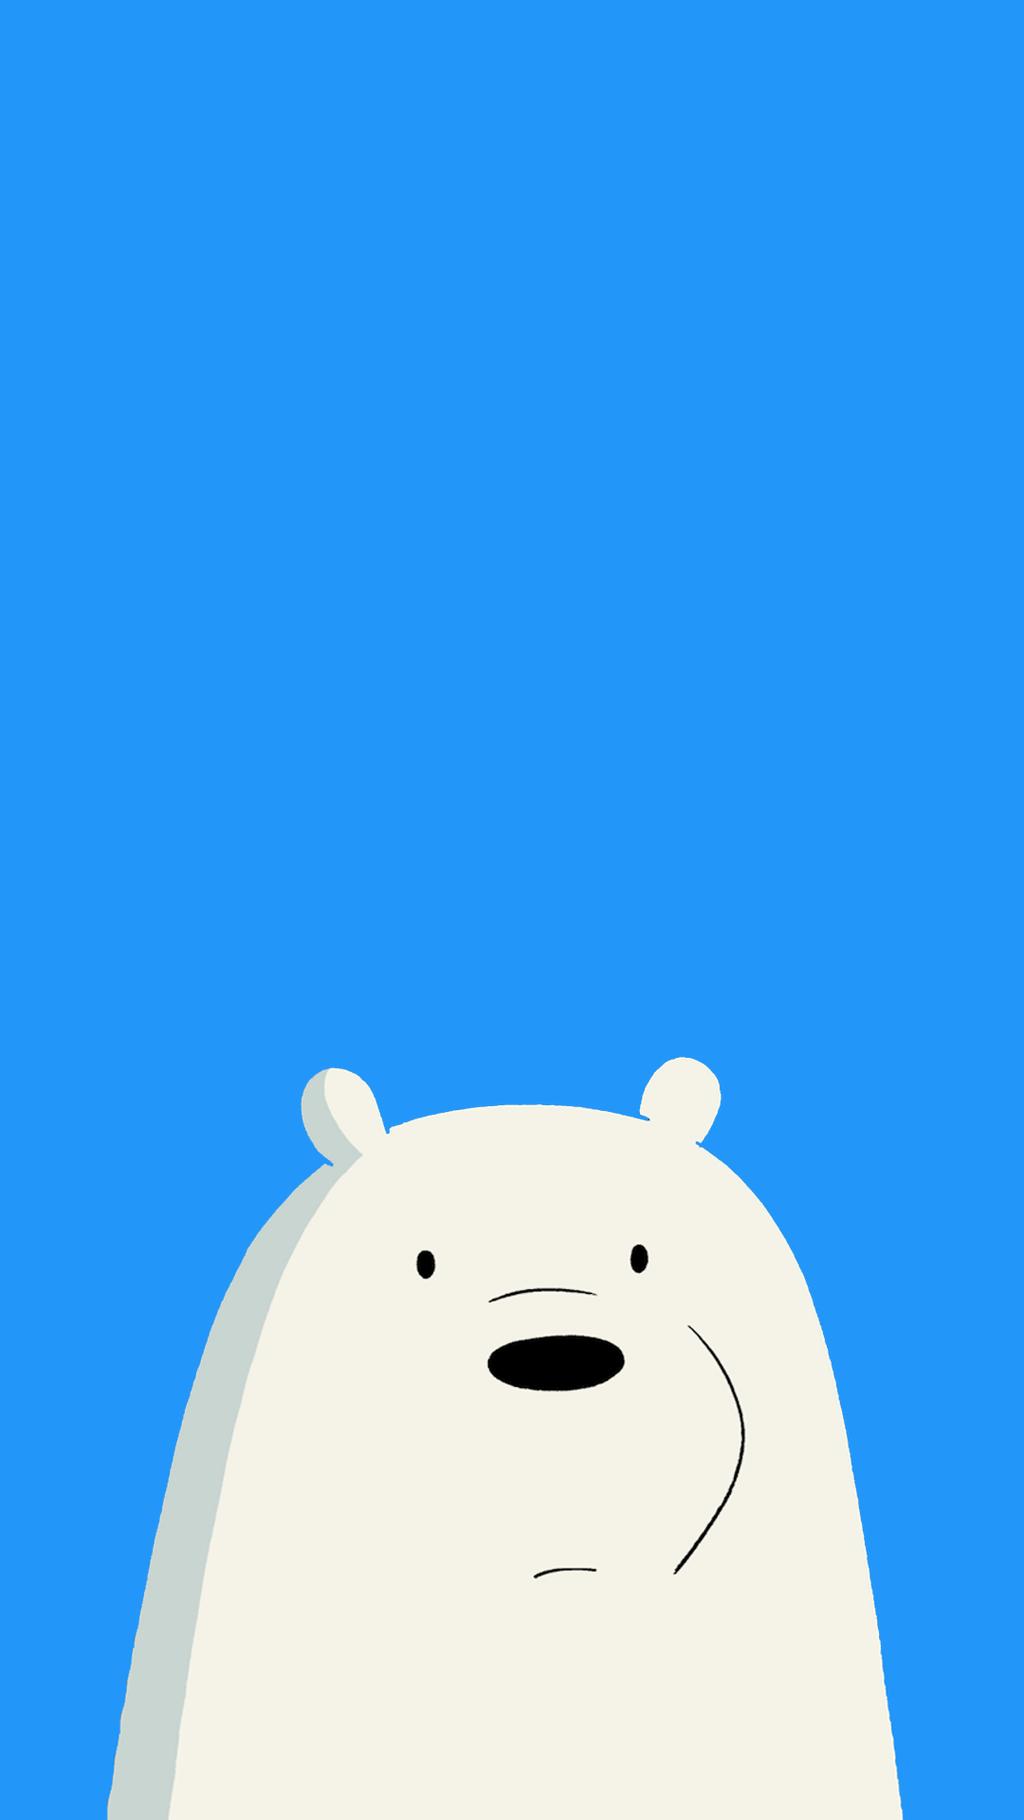 1080x1920 Hd Wallpaper Portrait We Bare Bears Wallpapers Wallpaper Cave